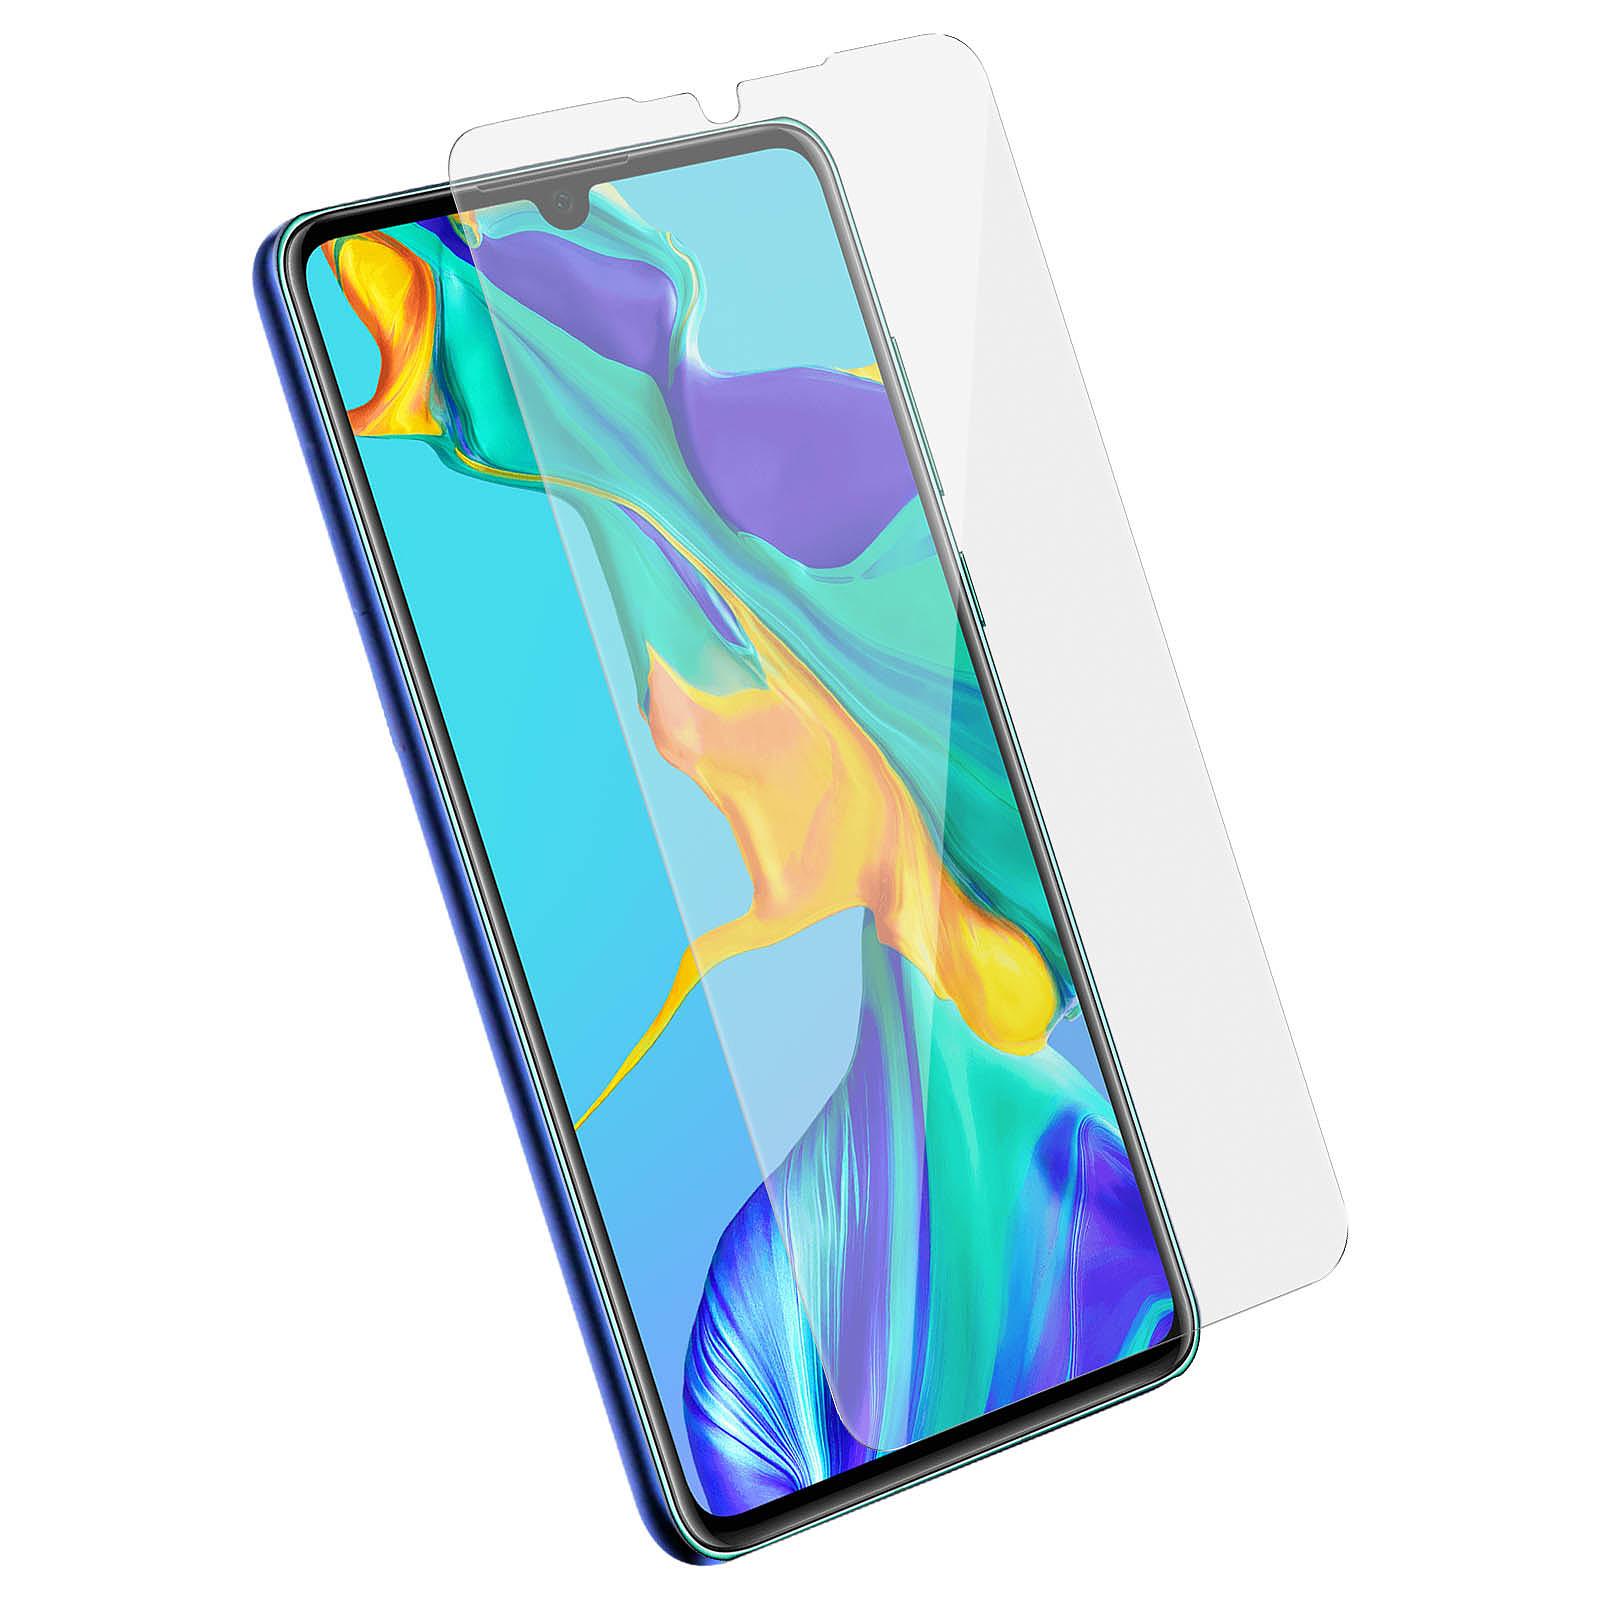 Avizar Film verre trempé Transparent pour Huawei P30